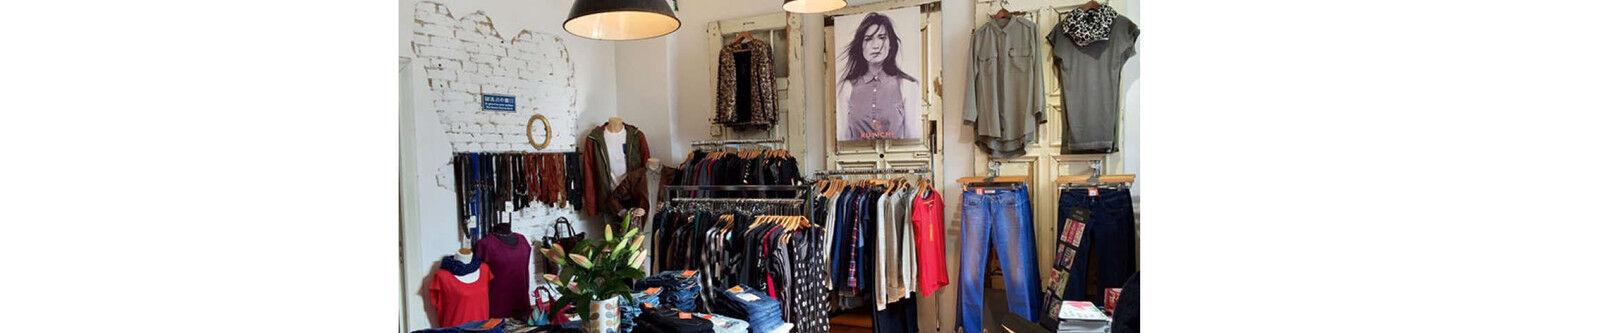 MeineModeBerlin-Shop